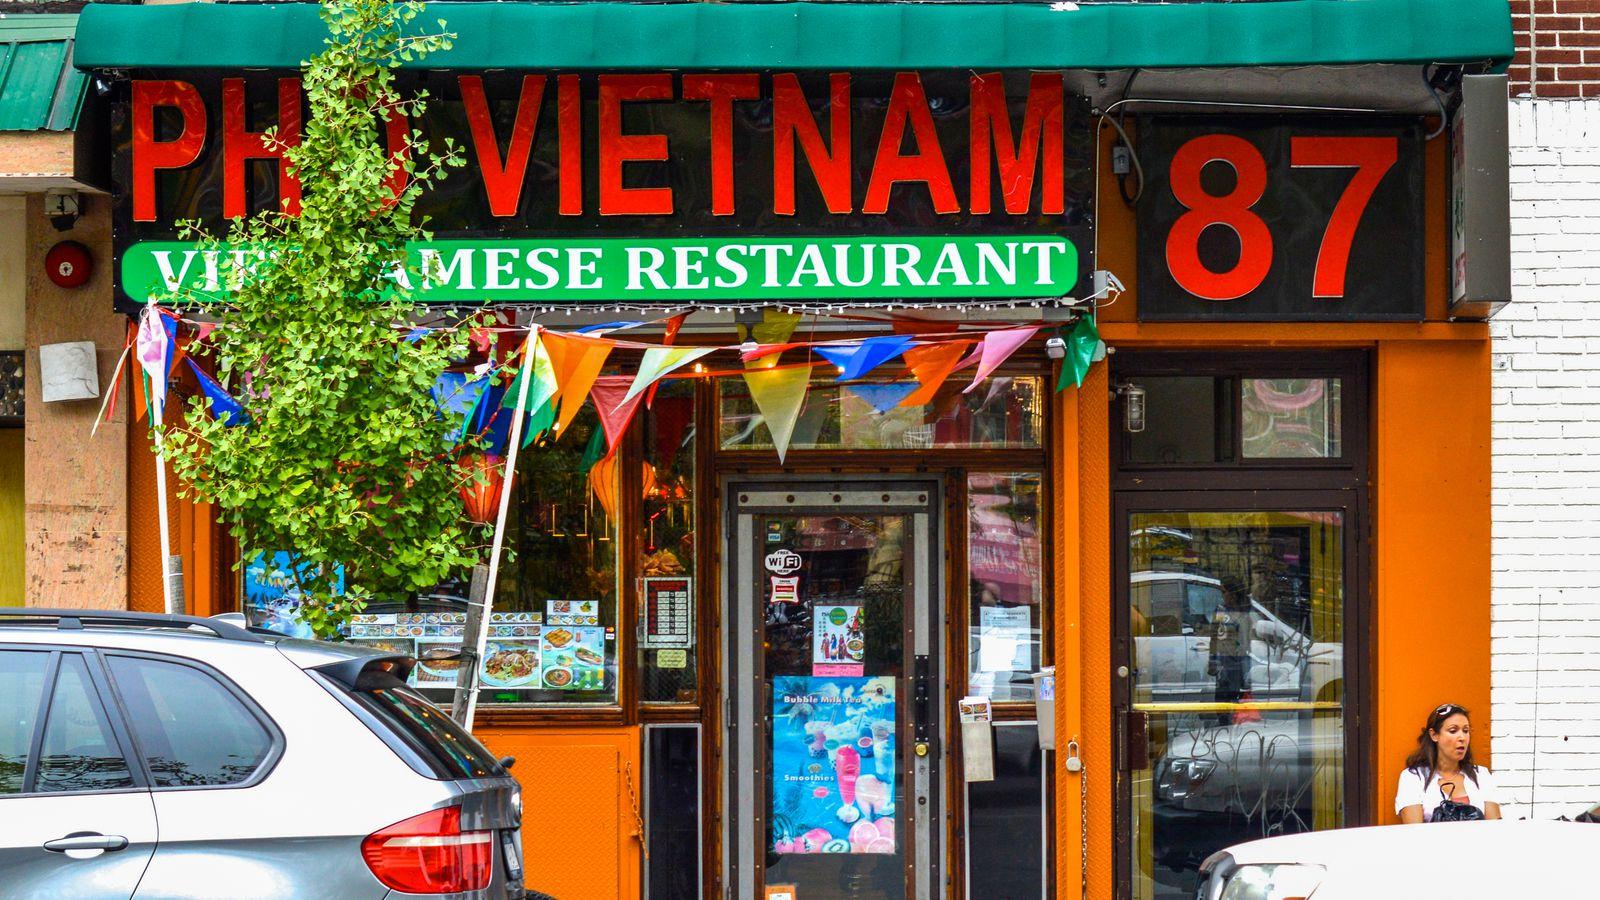 Pho Vietnam 87: A Cut Above Chinatown's Vietnamese Restaurants